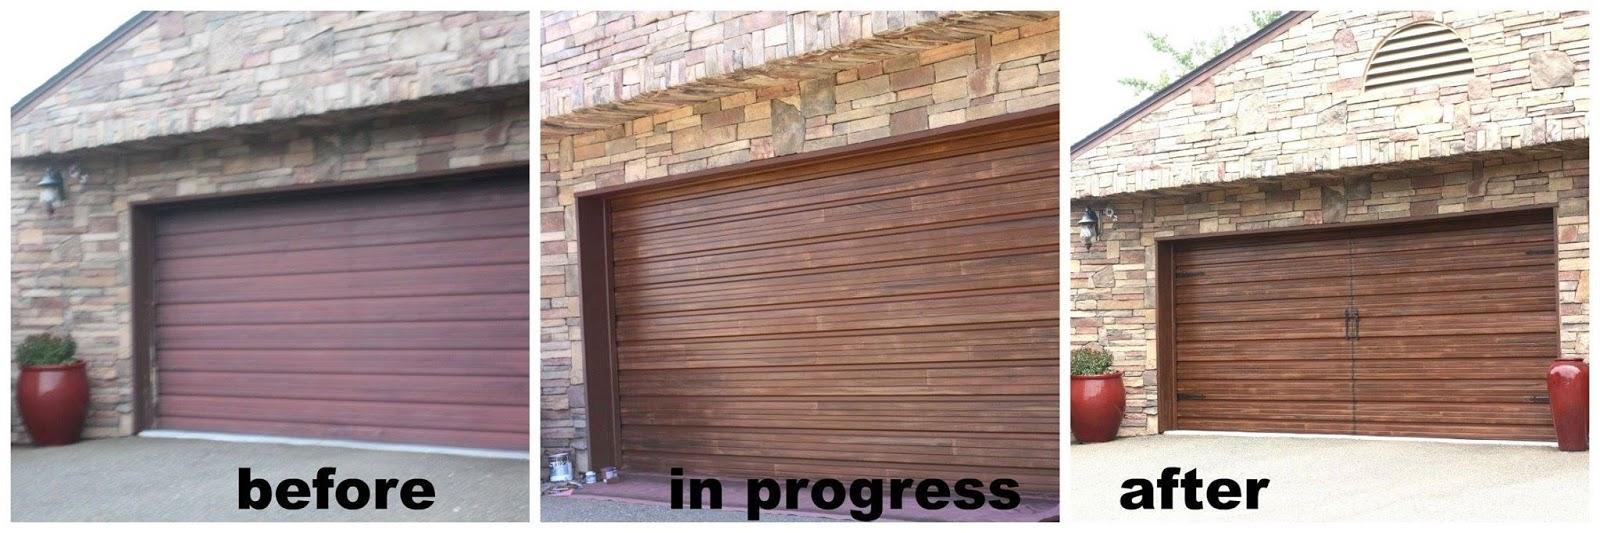 Faux Painted Garage Doors Life And Linda